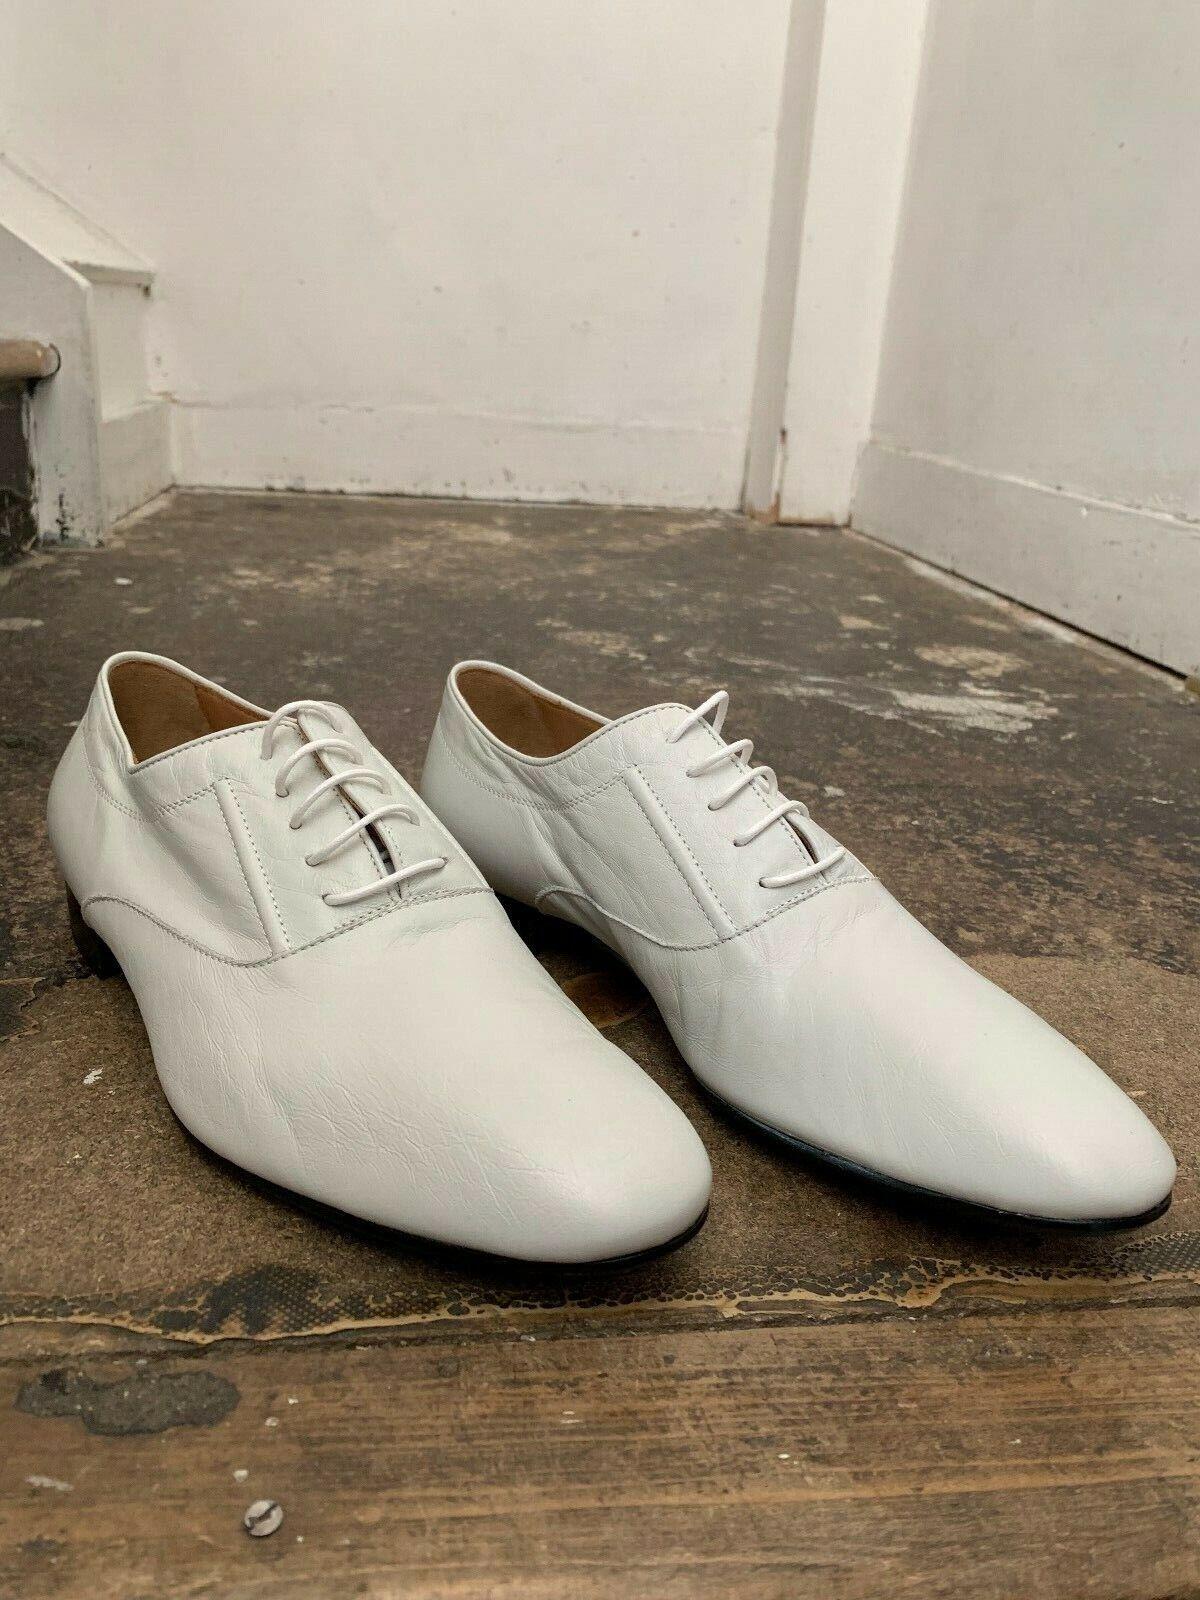 NEW Maison Martin Margiela Off White Oxford shoes GENUINE Size 42   BNIB